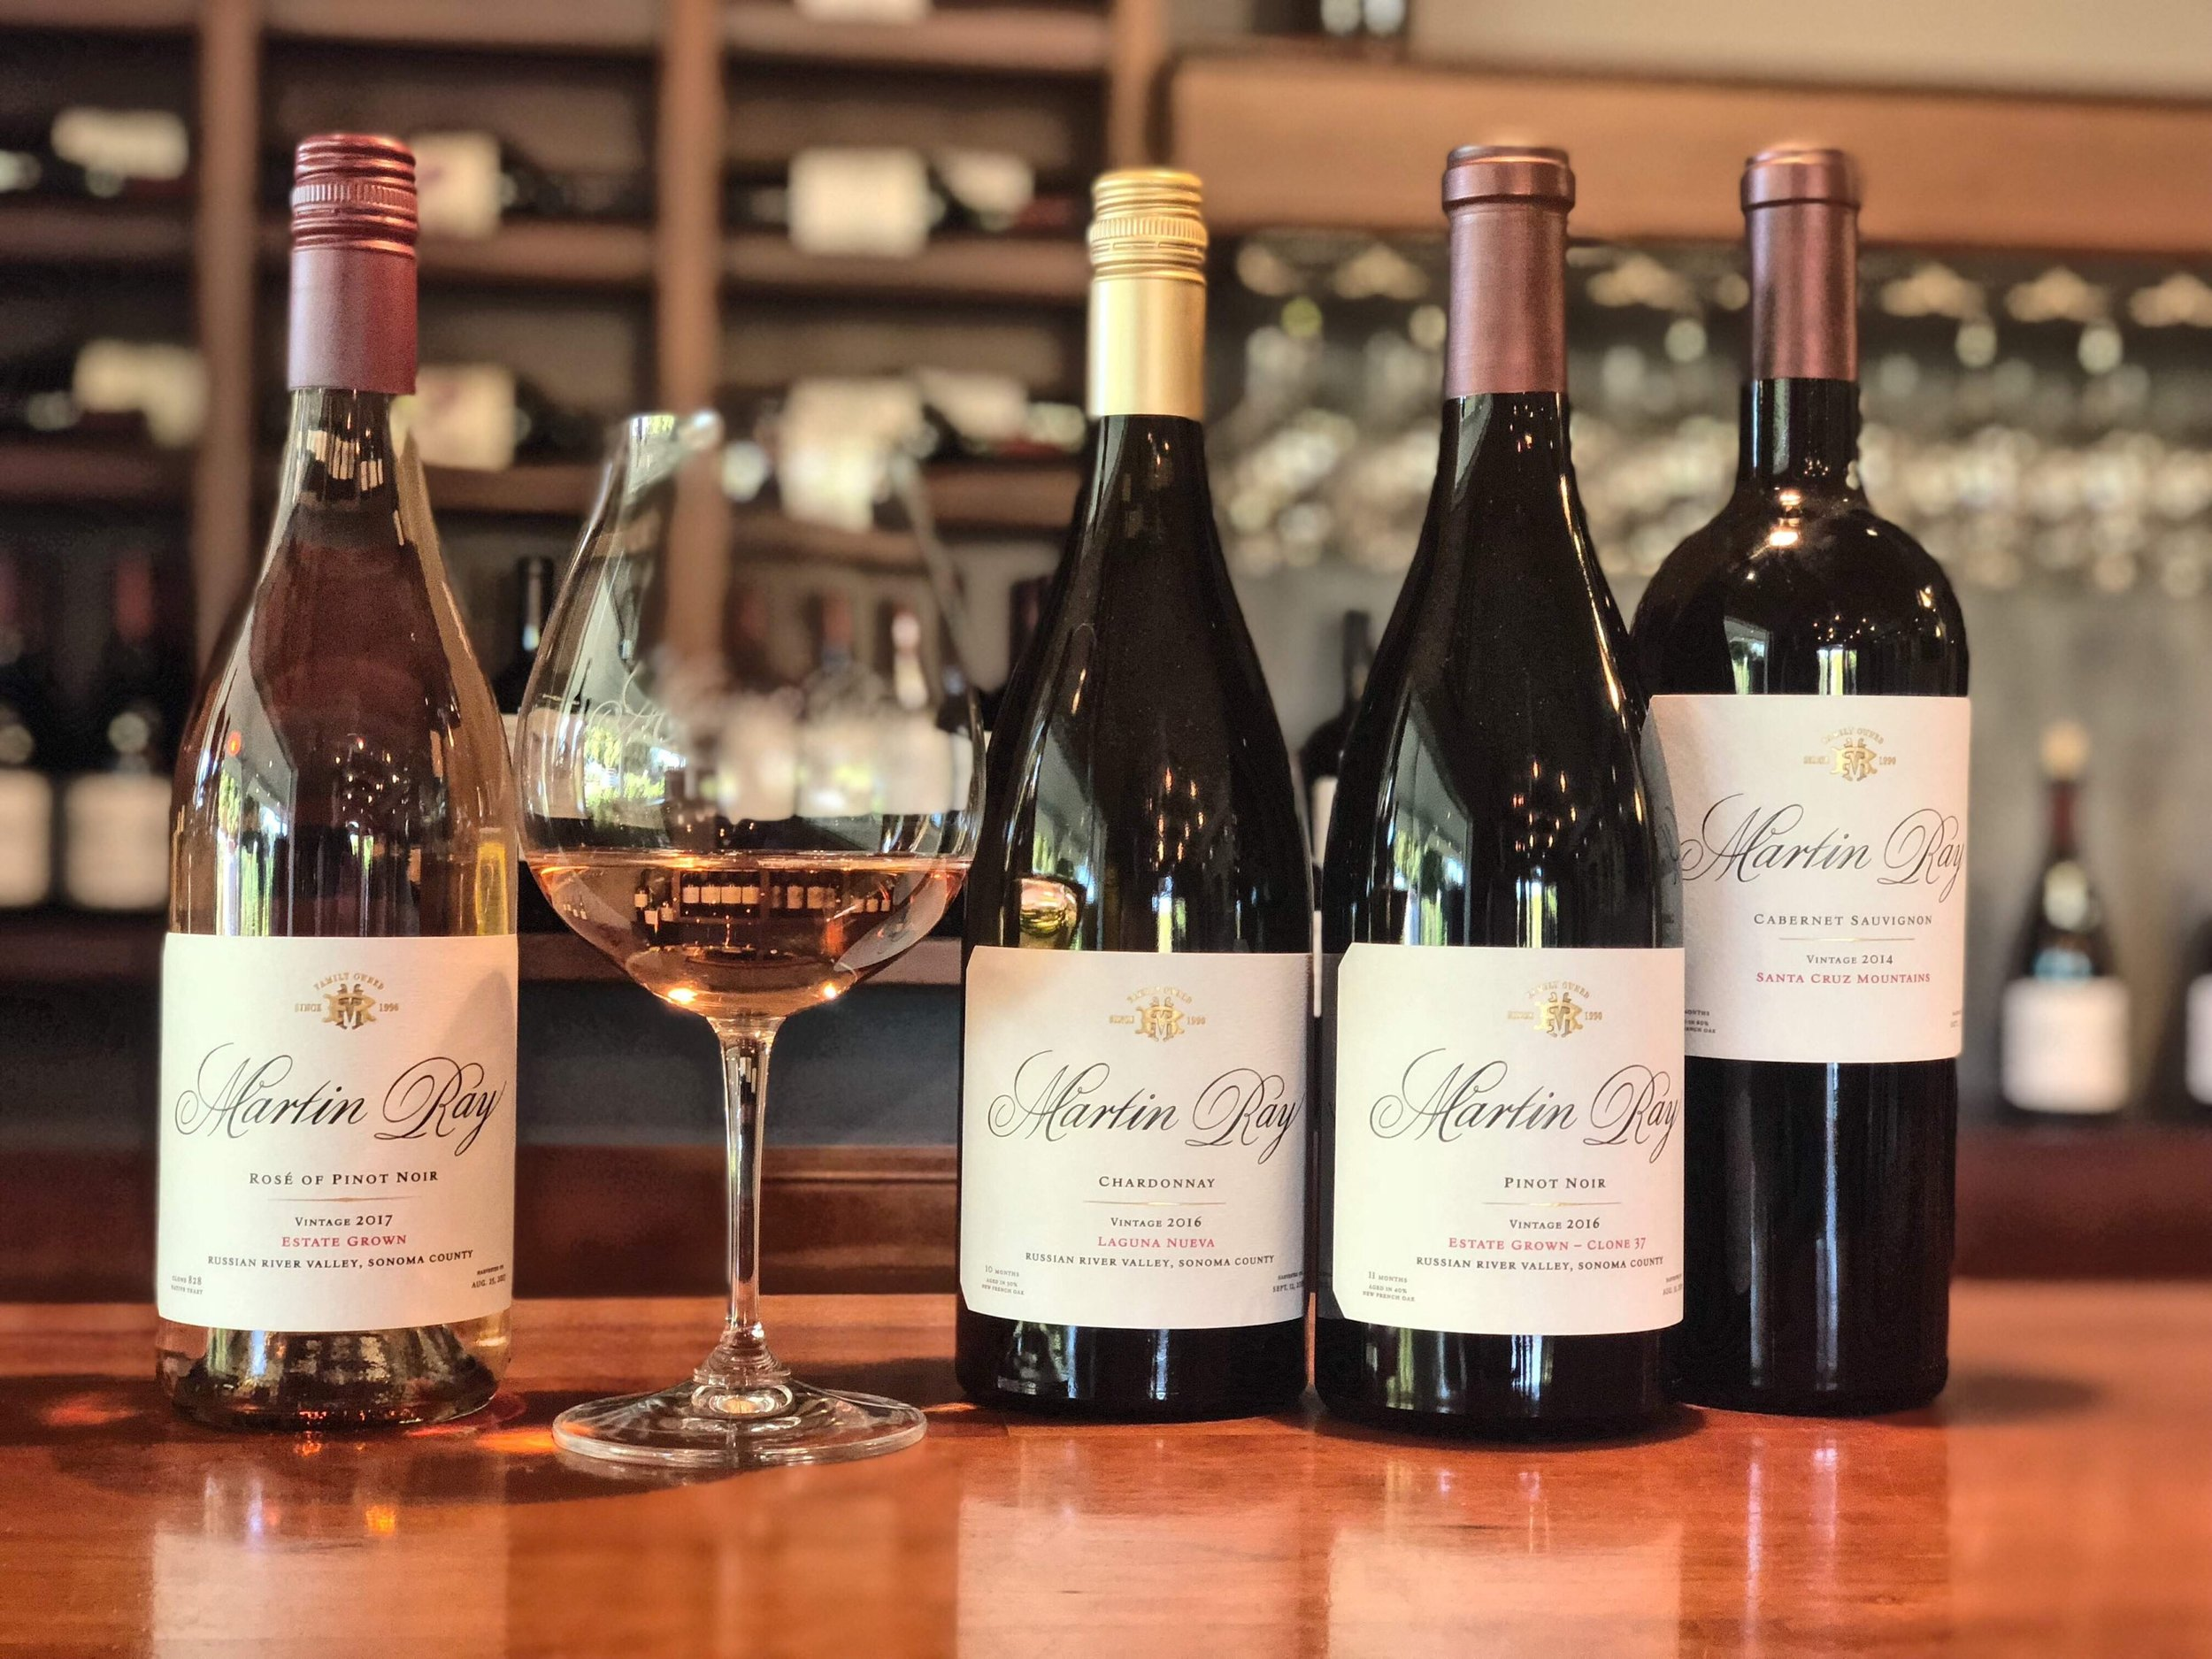 Chardonnay, Pinot Noir, Cabernet At Martin Ray